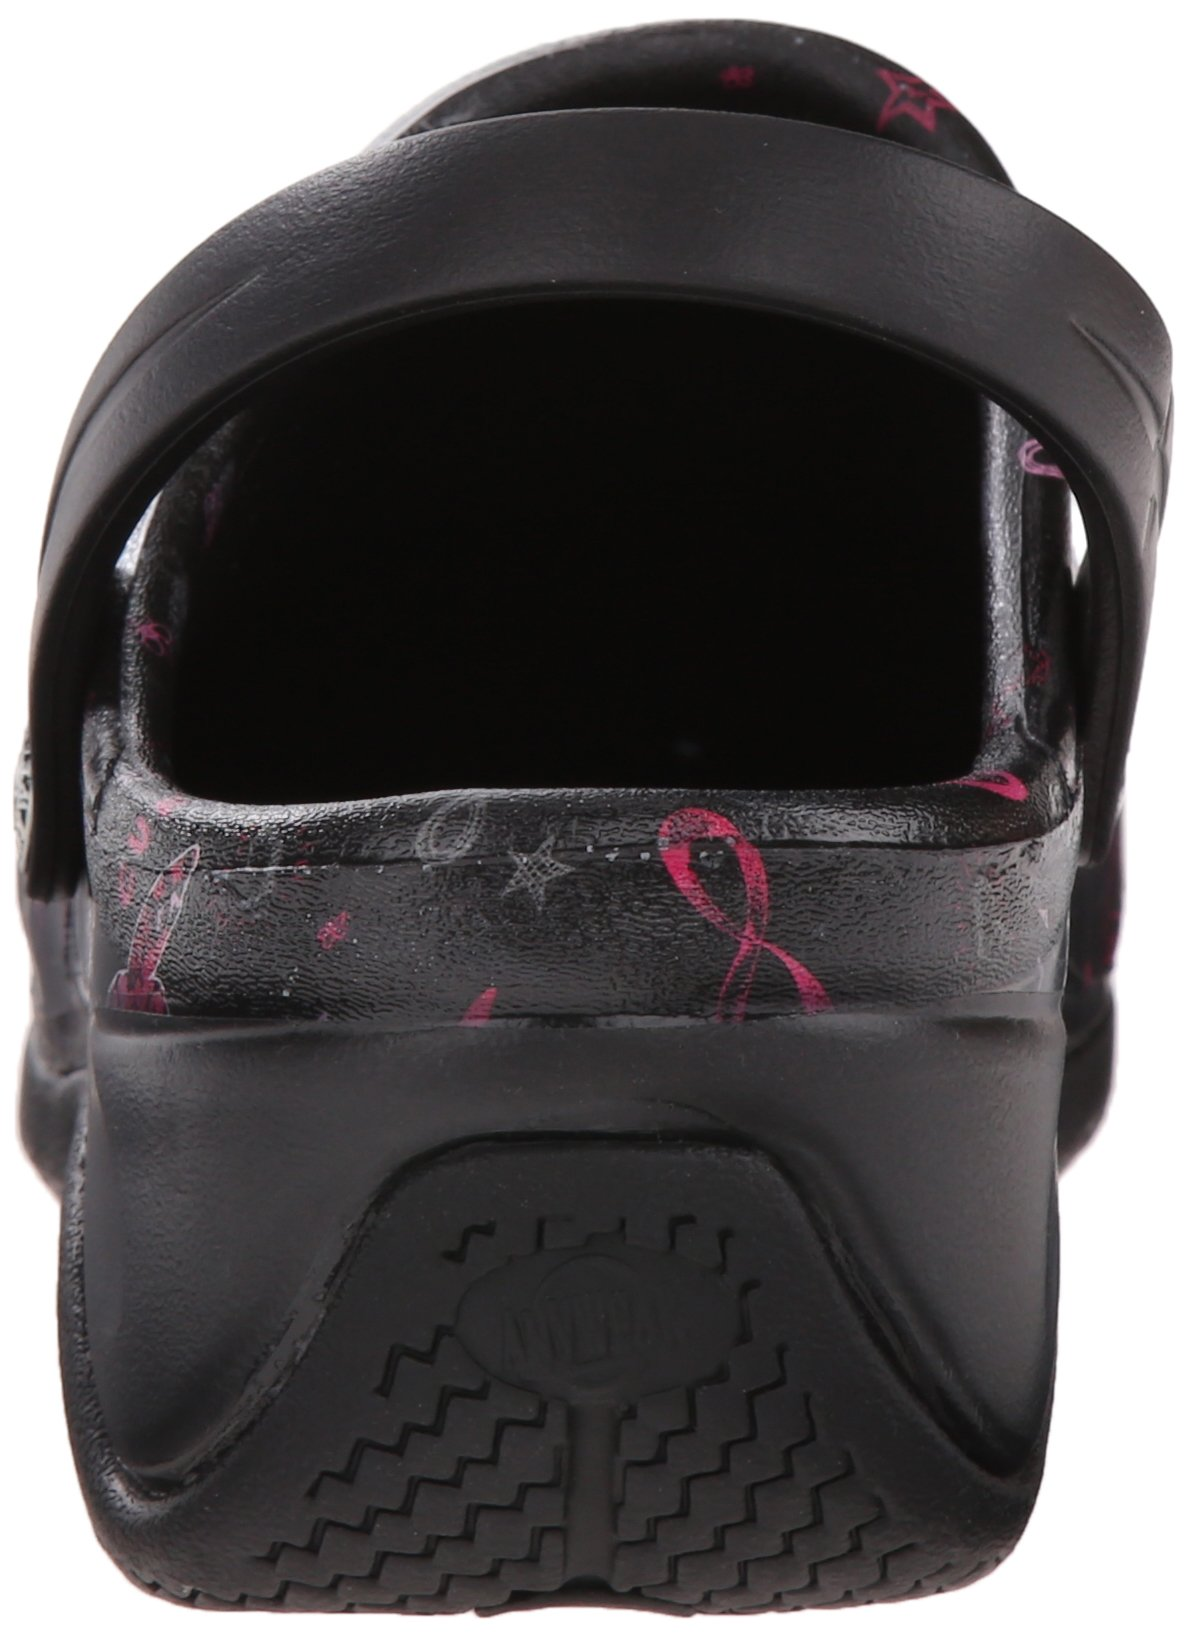 Anywear Women's Zone Work Shoe, Love Hope Cure/Pink Ribbon Print, 8 M US by Anywear (Image #2)